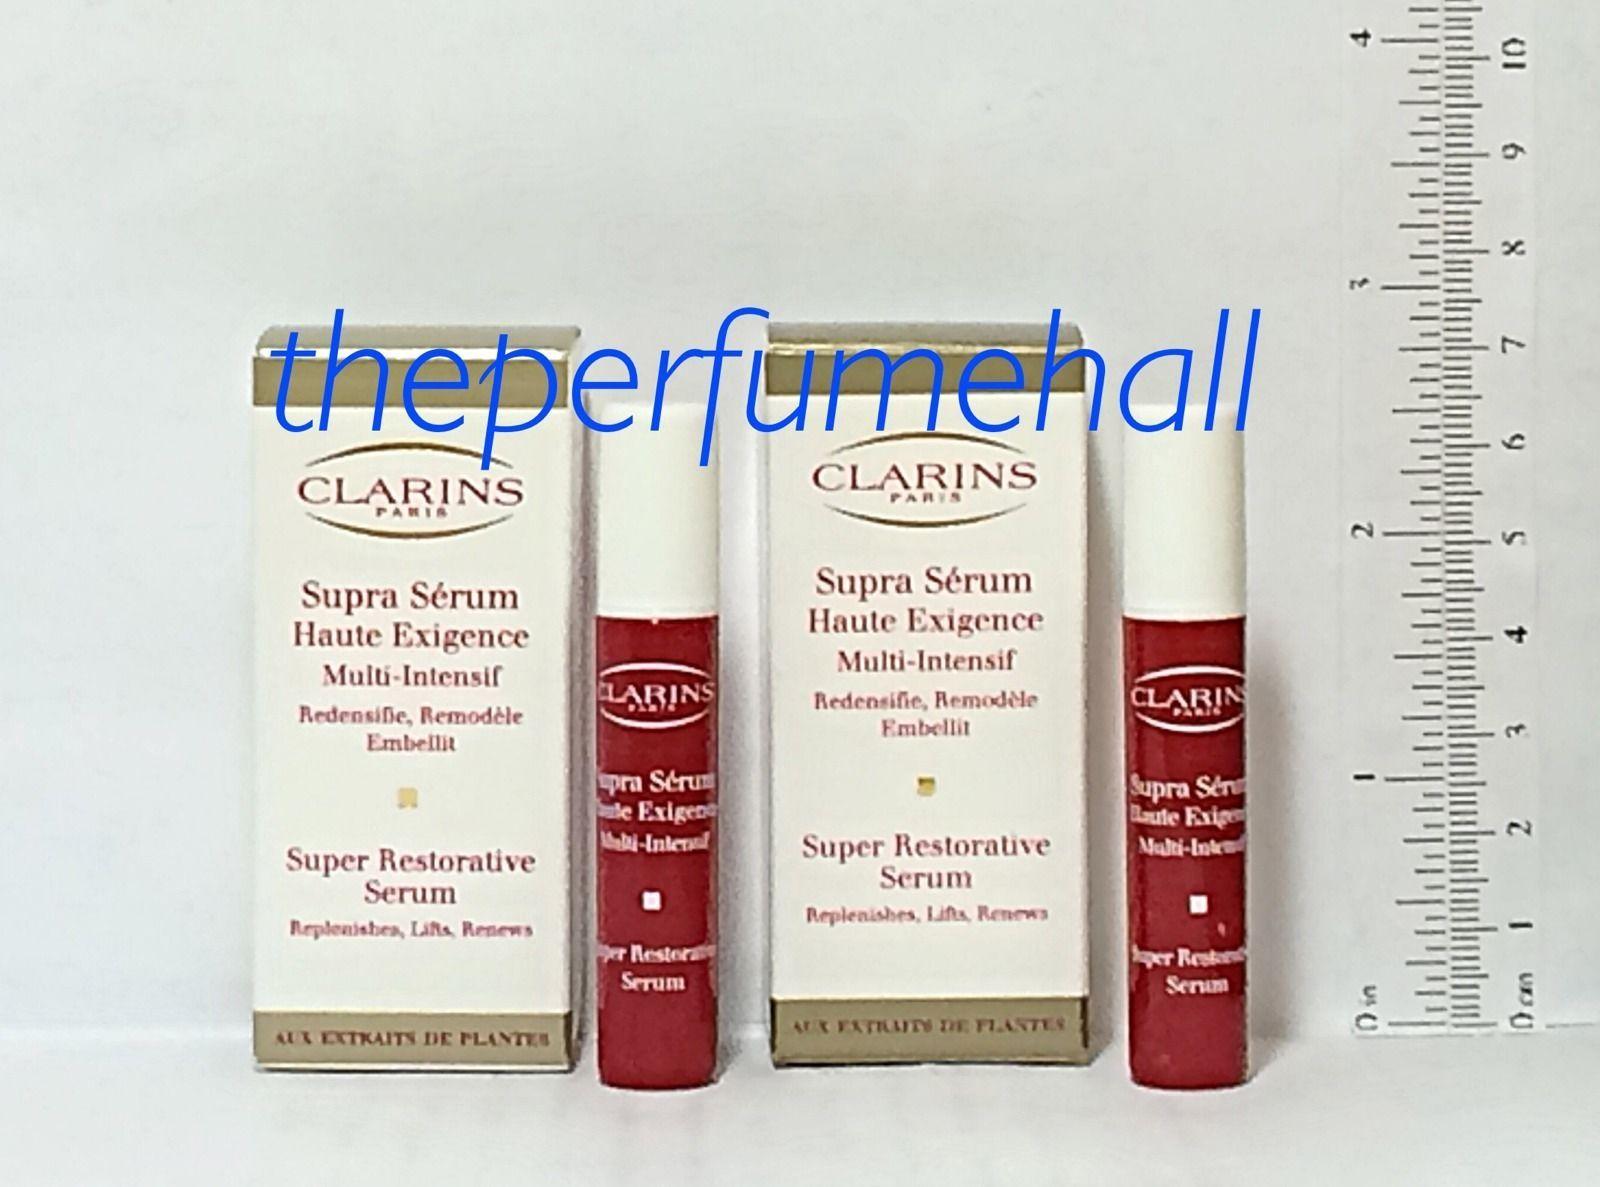 Clarins Serum 64 Listings Hydraquench Cream Gel Normal To Combination Skin 15ml Super Restorative Sample Size 2 X 2ml Travel 1682